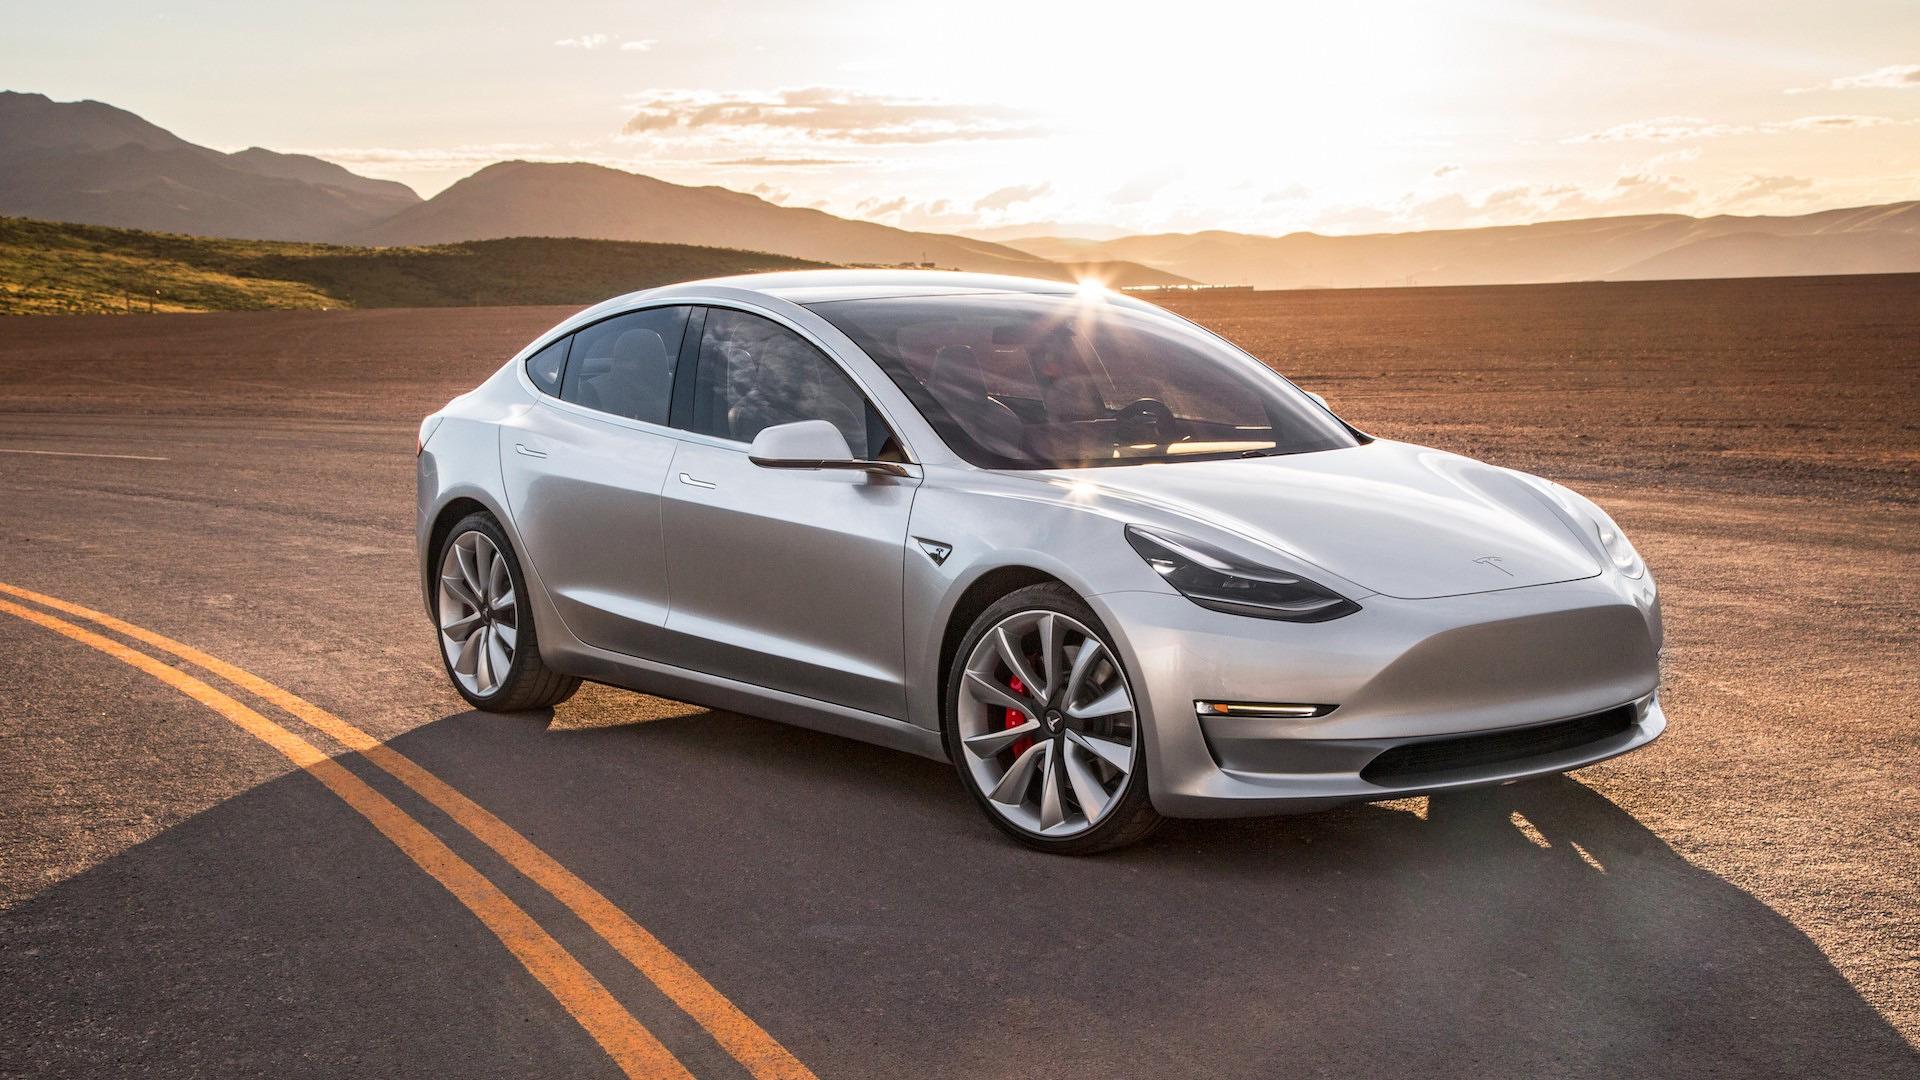 Latest Tesla Easter Egg Lets You Send Sketches To Elon Musk